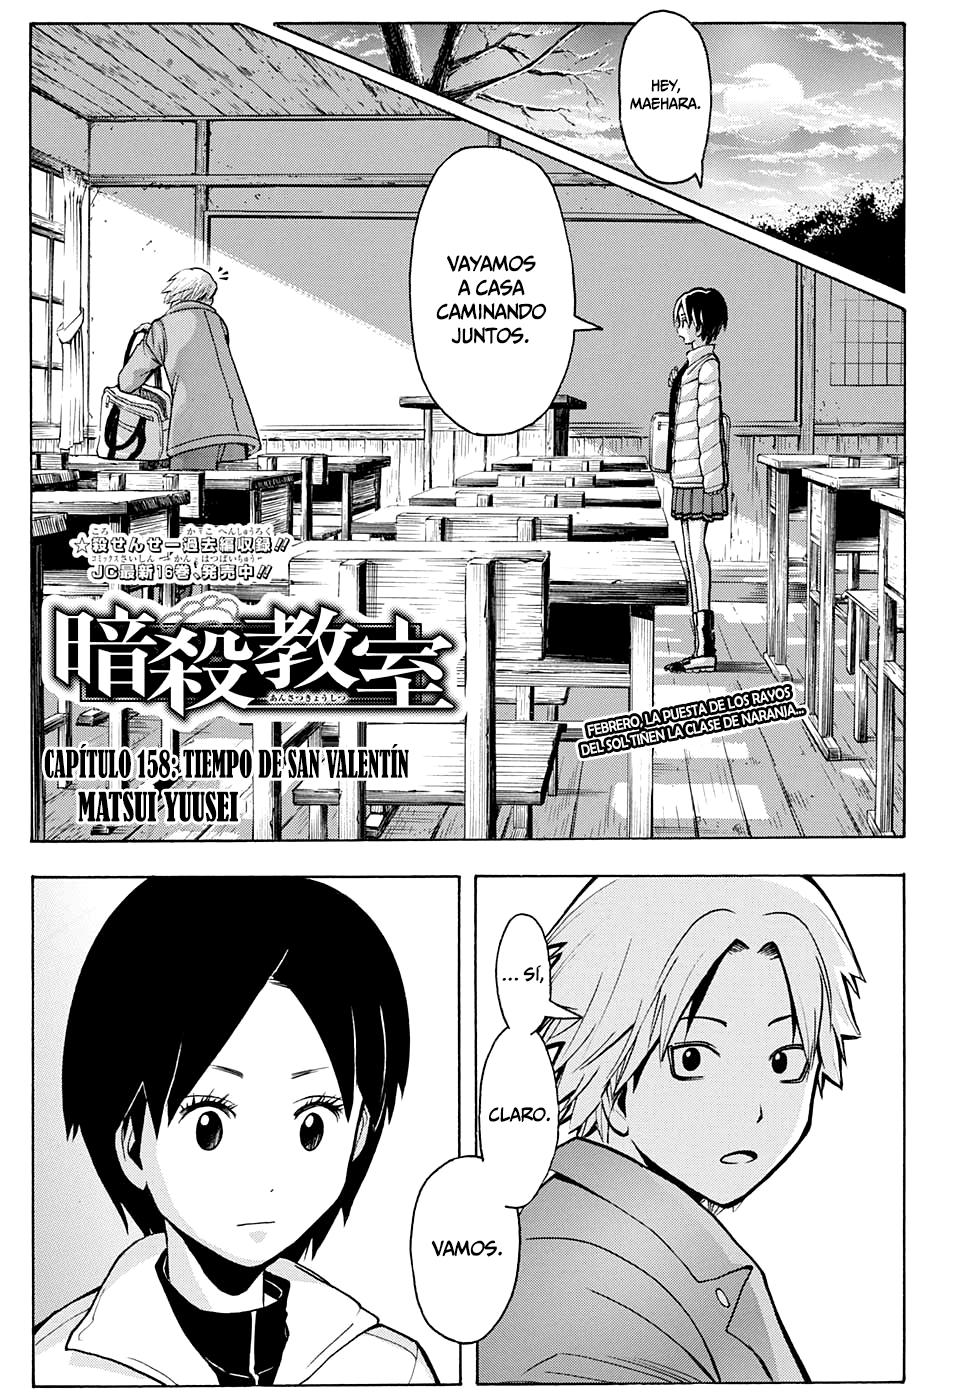 http://c5.ninemanga.com/es_manga/63/255/419733/4e29c8572edb3e6c1a0eaad5ad36423e.jpg Page 3